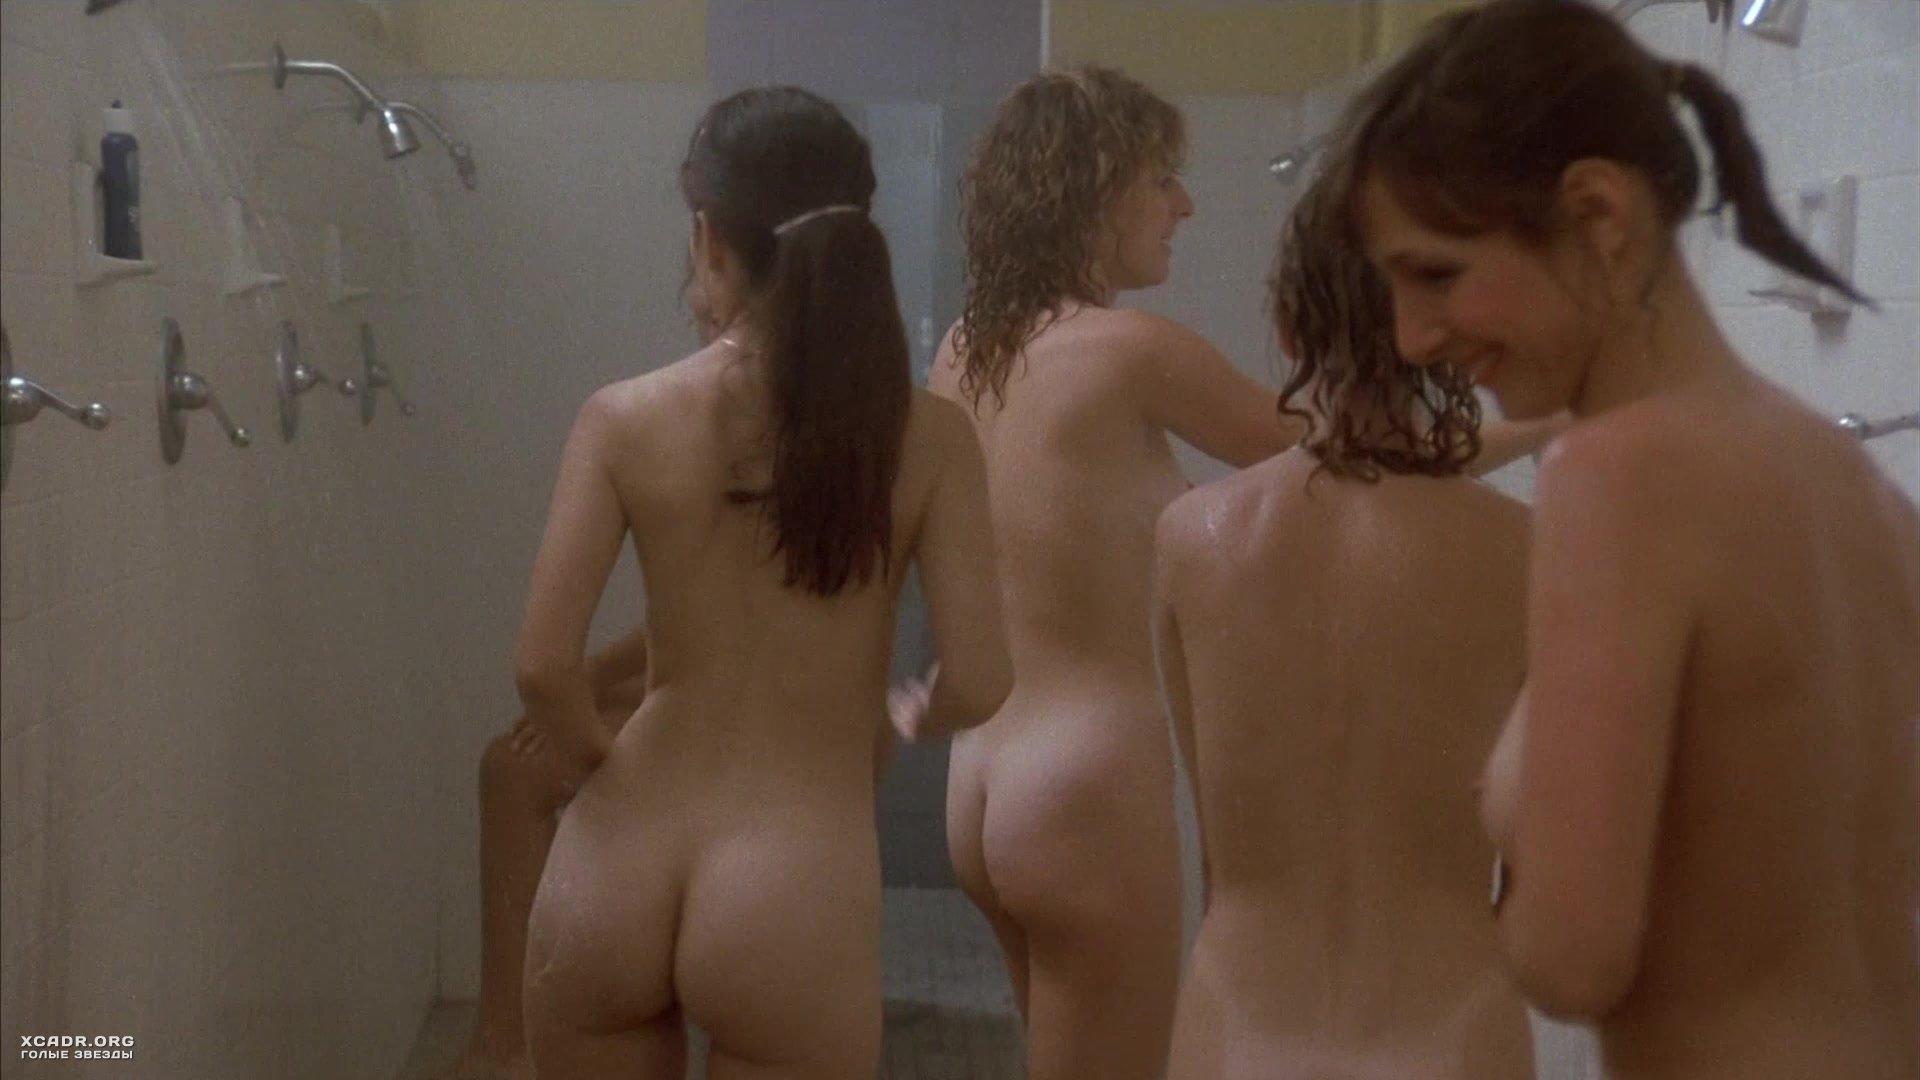 Dukes of hazzard nude scene girls